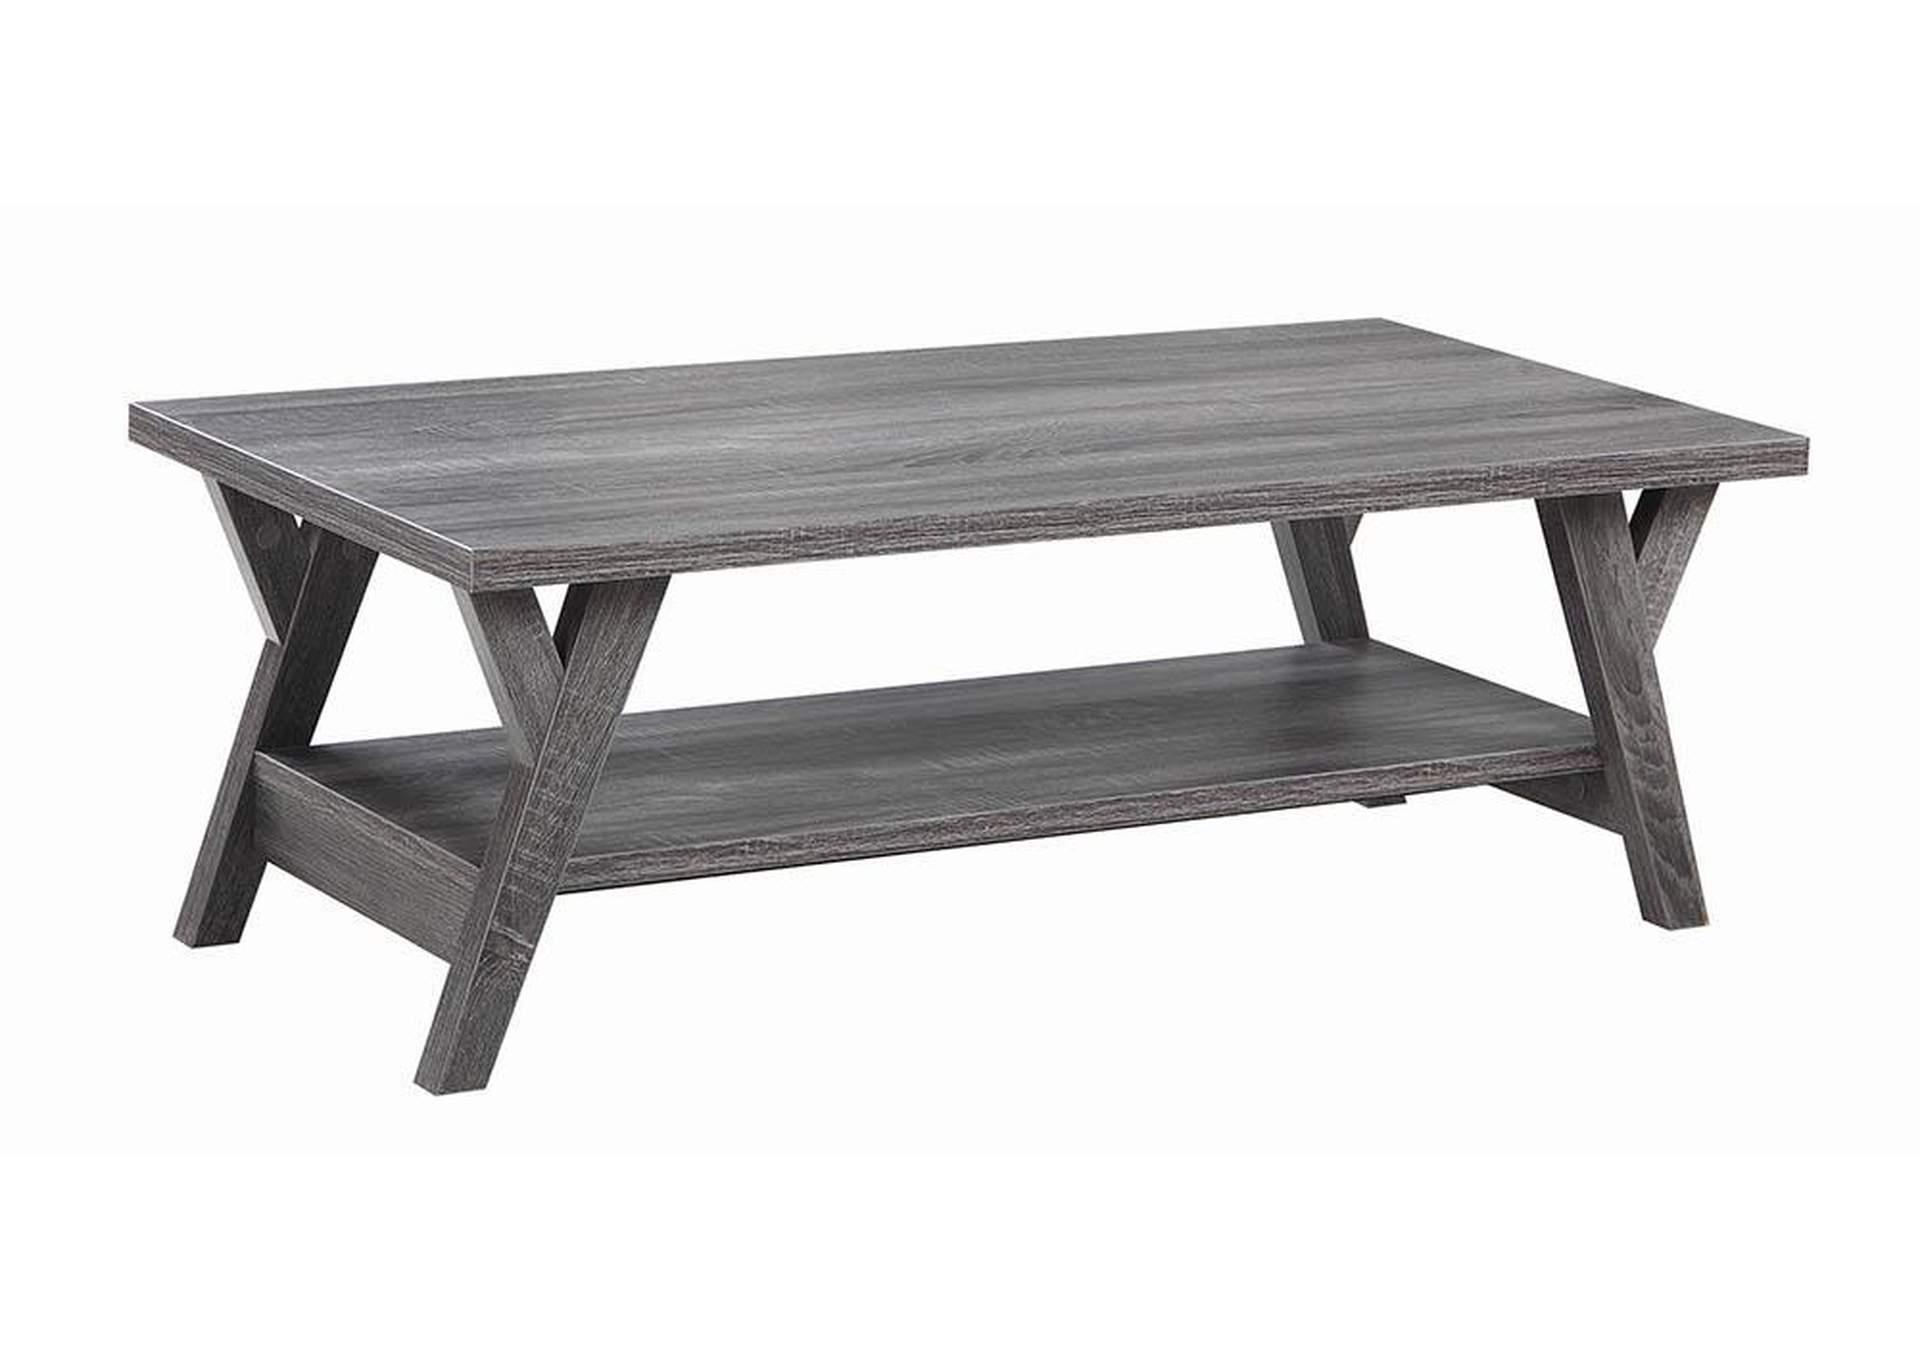 Brilliant Alberts Home Furnishings Distressed Grey Coffee Table Machost Co Dining Chair Design Ideas Machostcouk